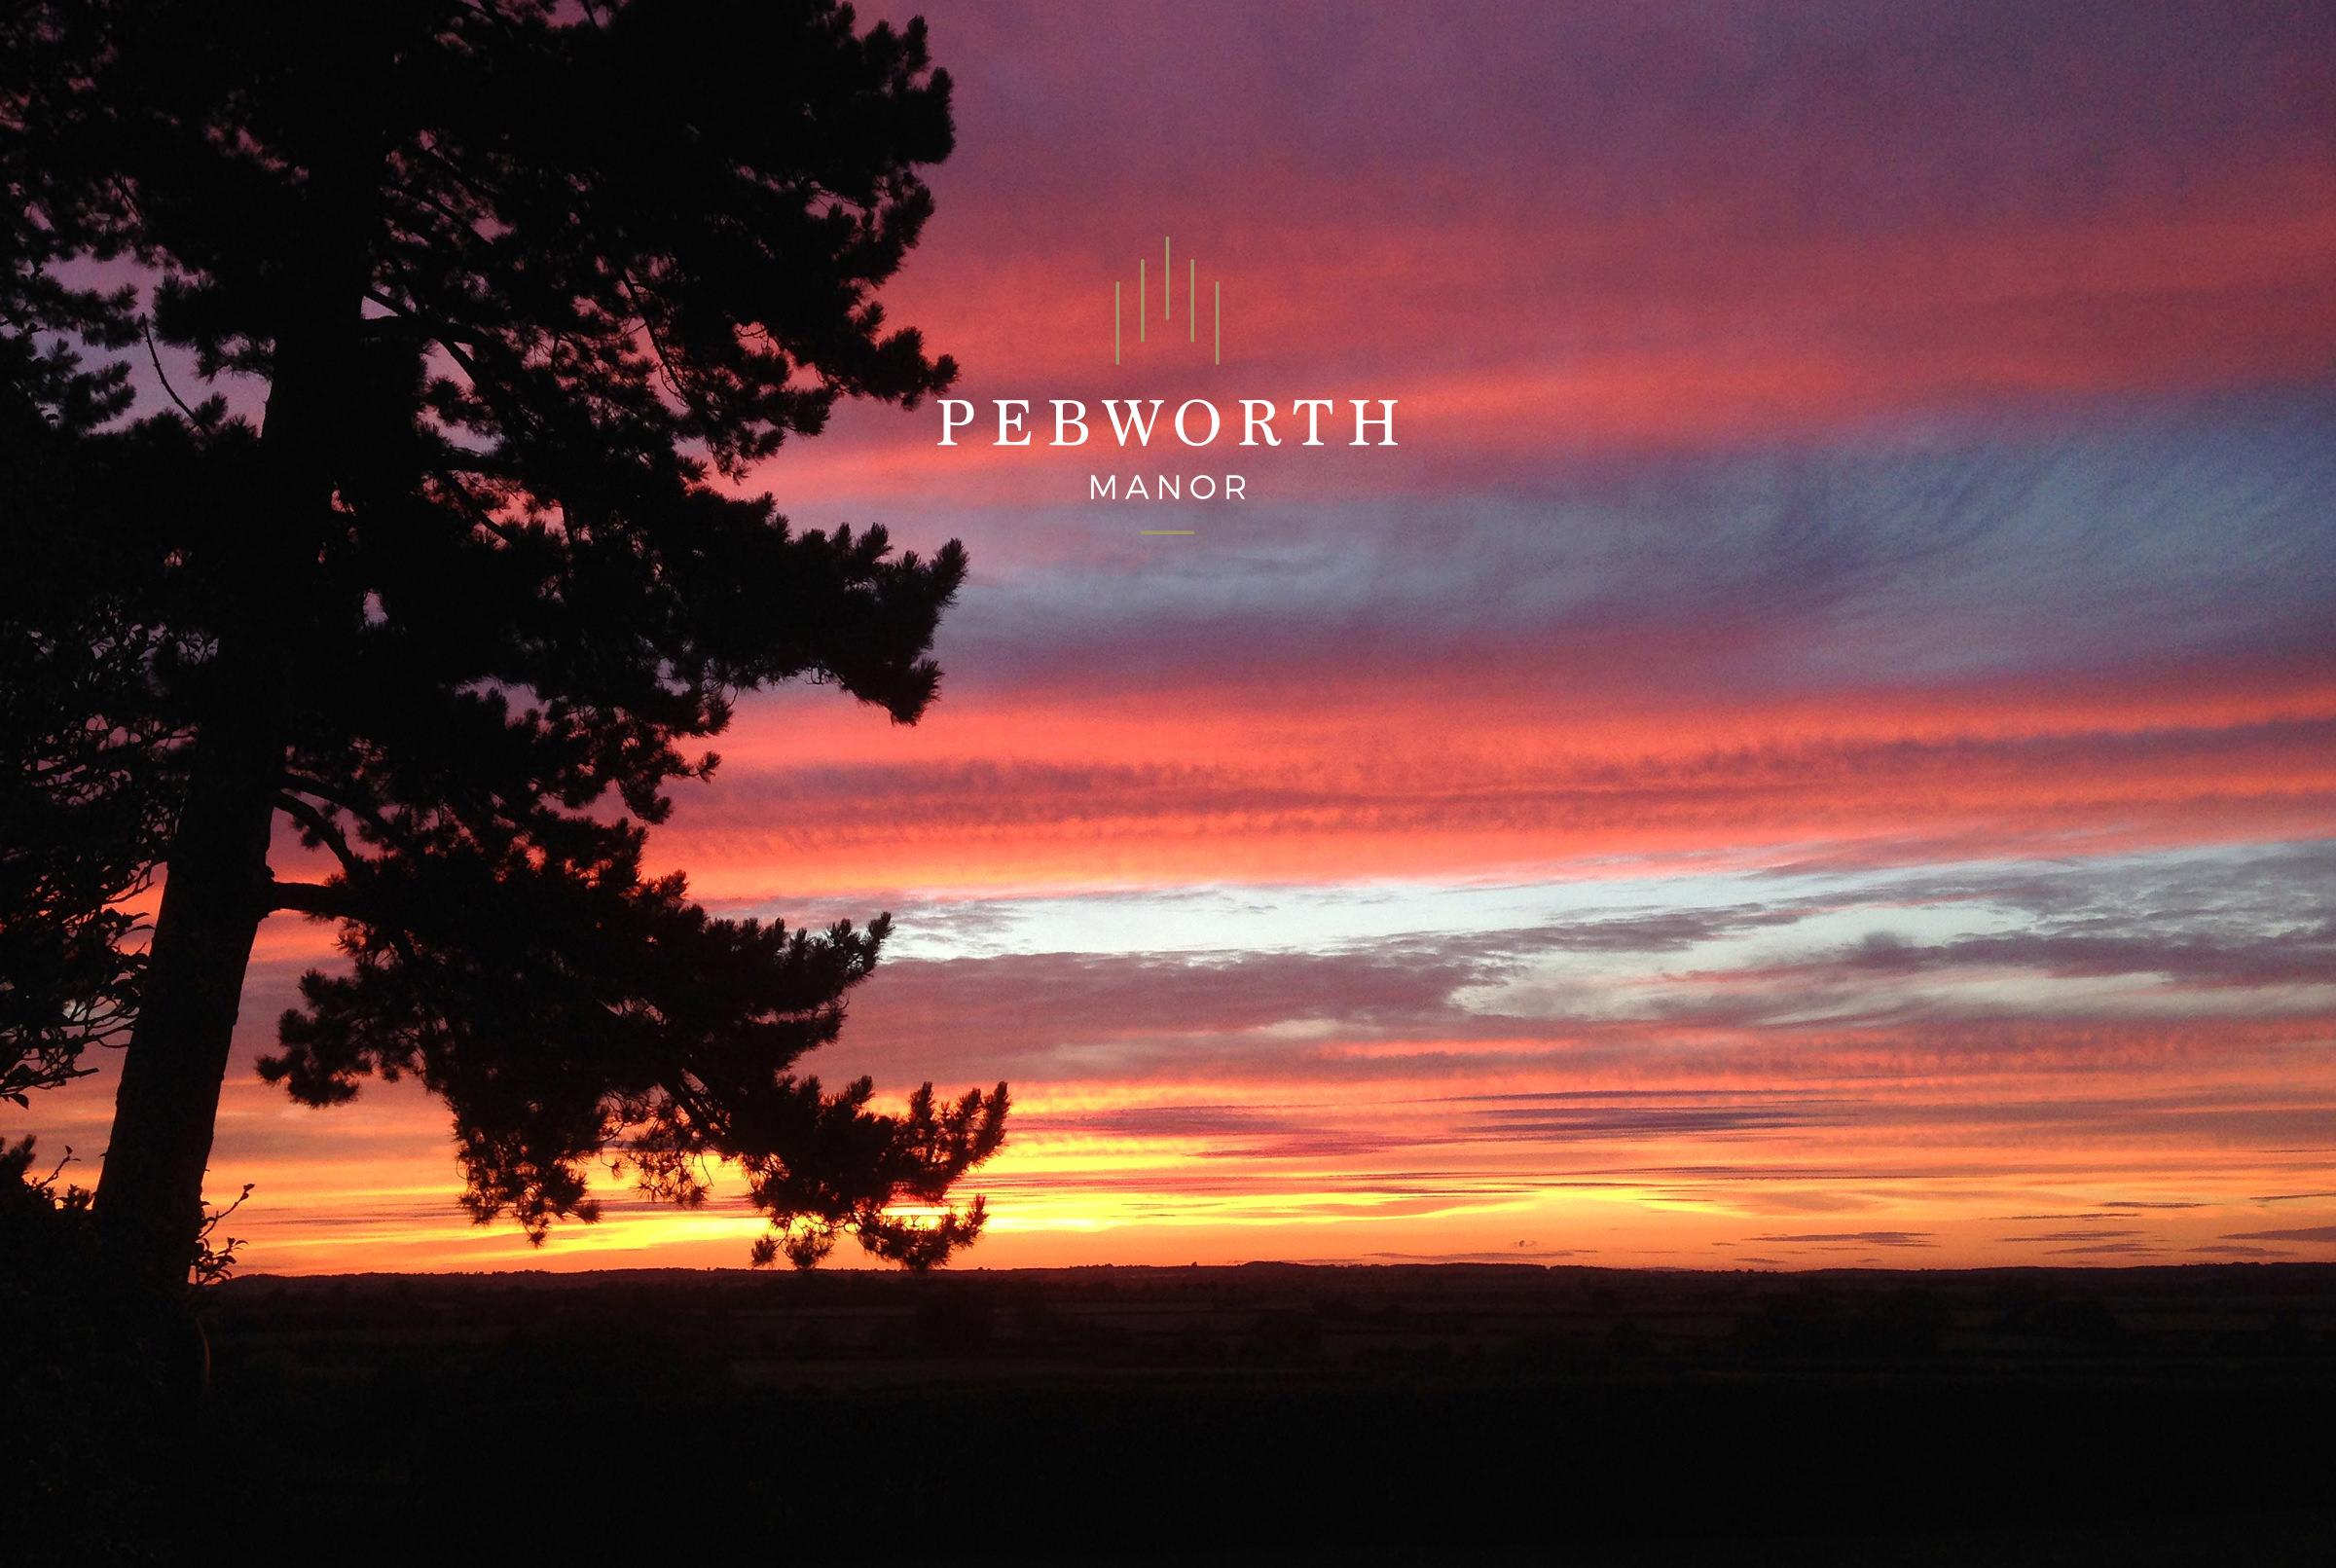 Sunset at Pebworth Manor